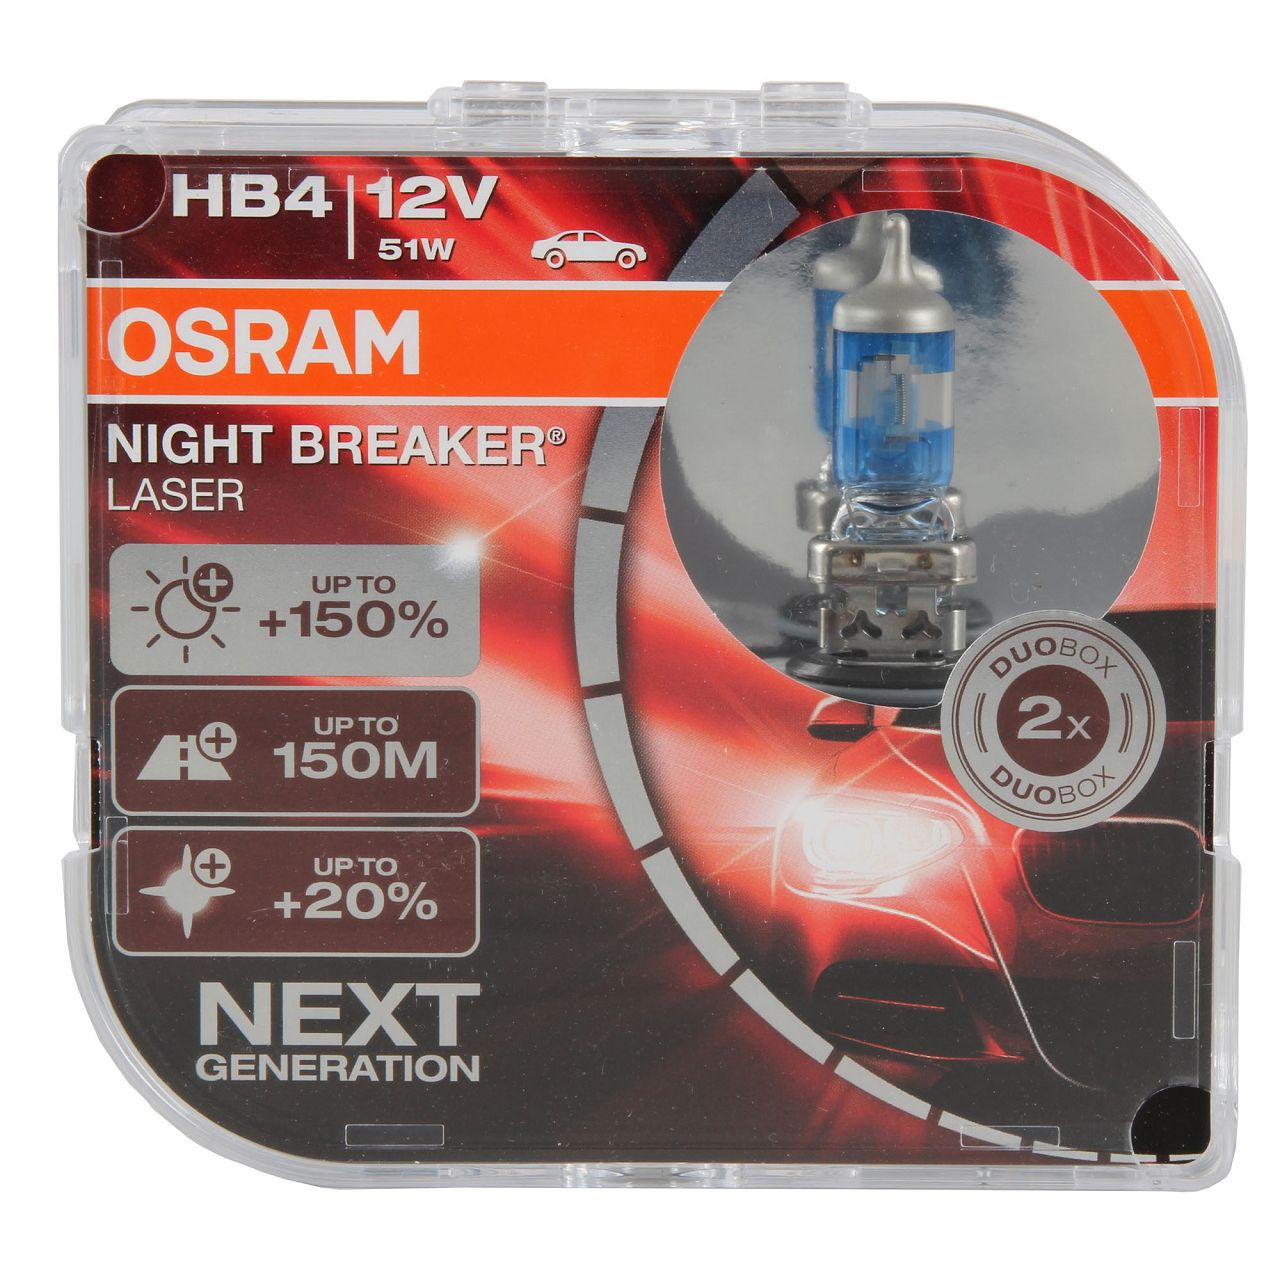 2x OSRAM Glühlampe HB4 NIGHT BREAKER LASER 12V 51W P22d next Generation +150%